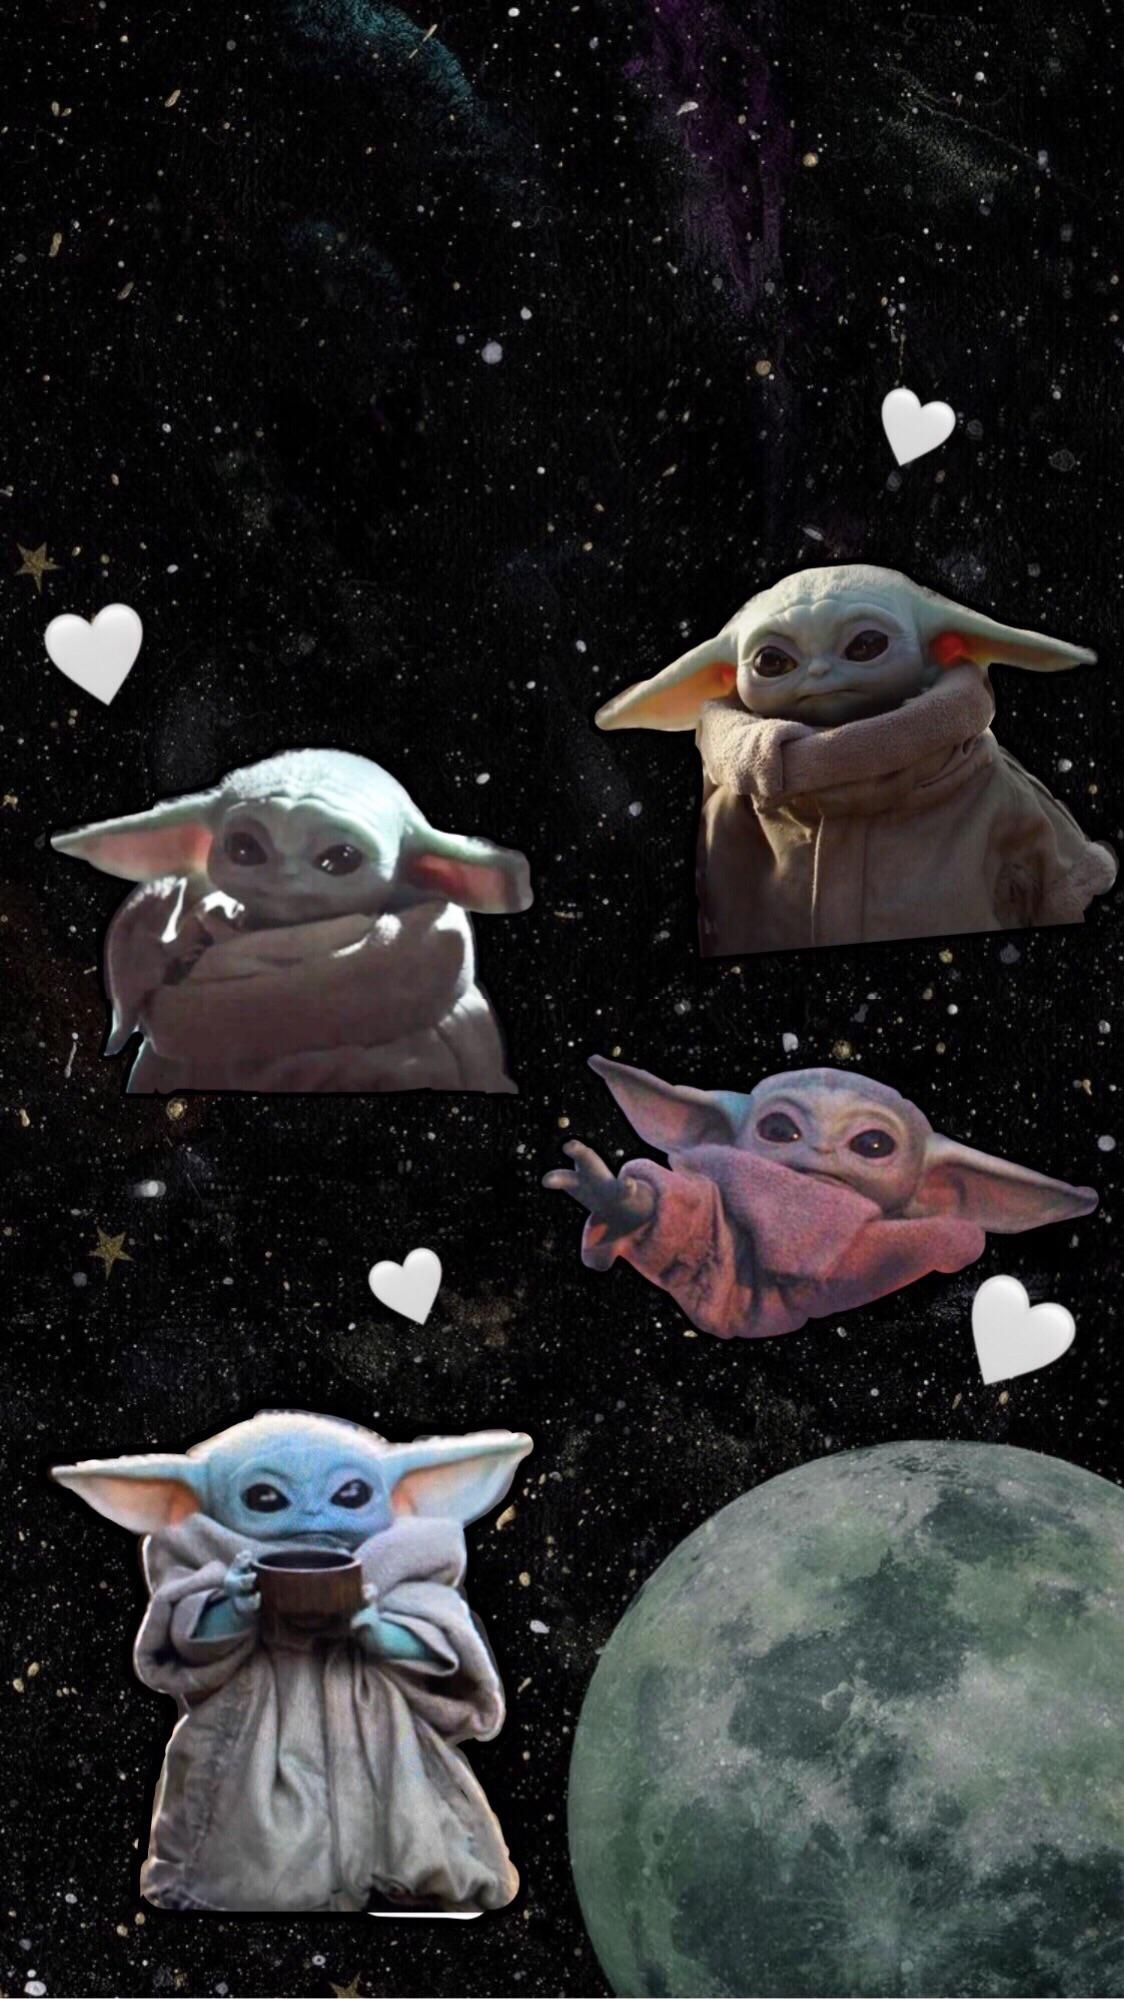 Made A Baby Yoda Lockscreen Wallpaper R Babyyoda Baby Yoda Grogu Yoda Wallpaper Star Wars Wallpaper Star Wars Art